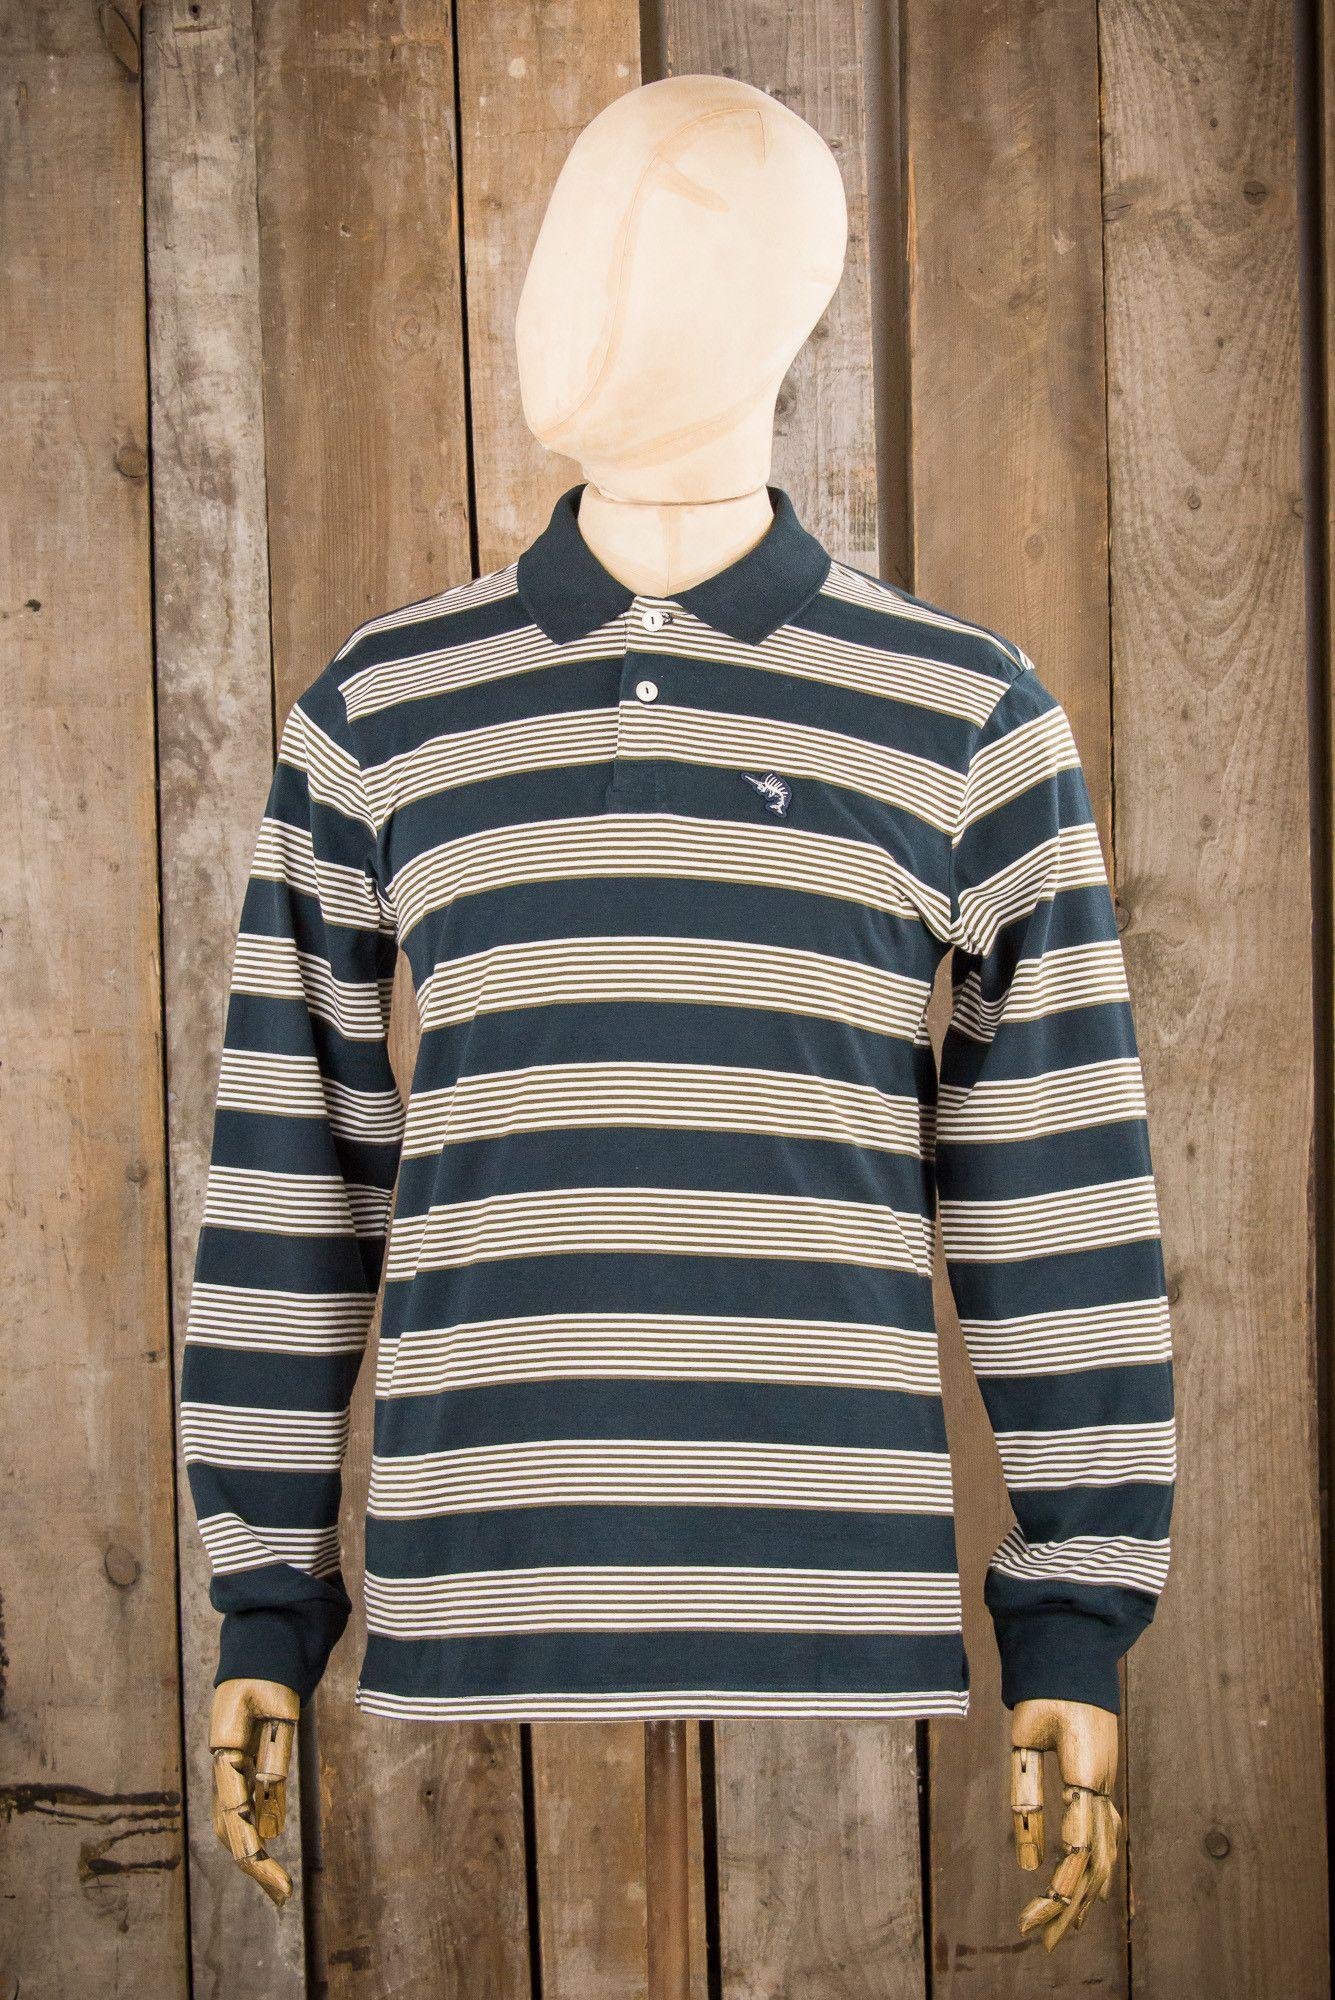 The Dark Seas Jib Ls Polo Shirt Is A Loose Fit Long Sleeve Polo